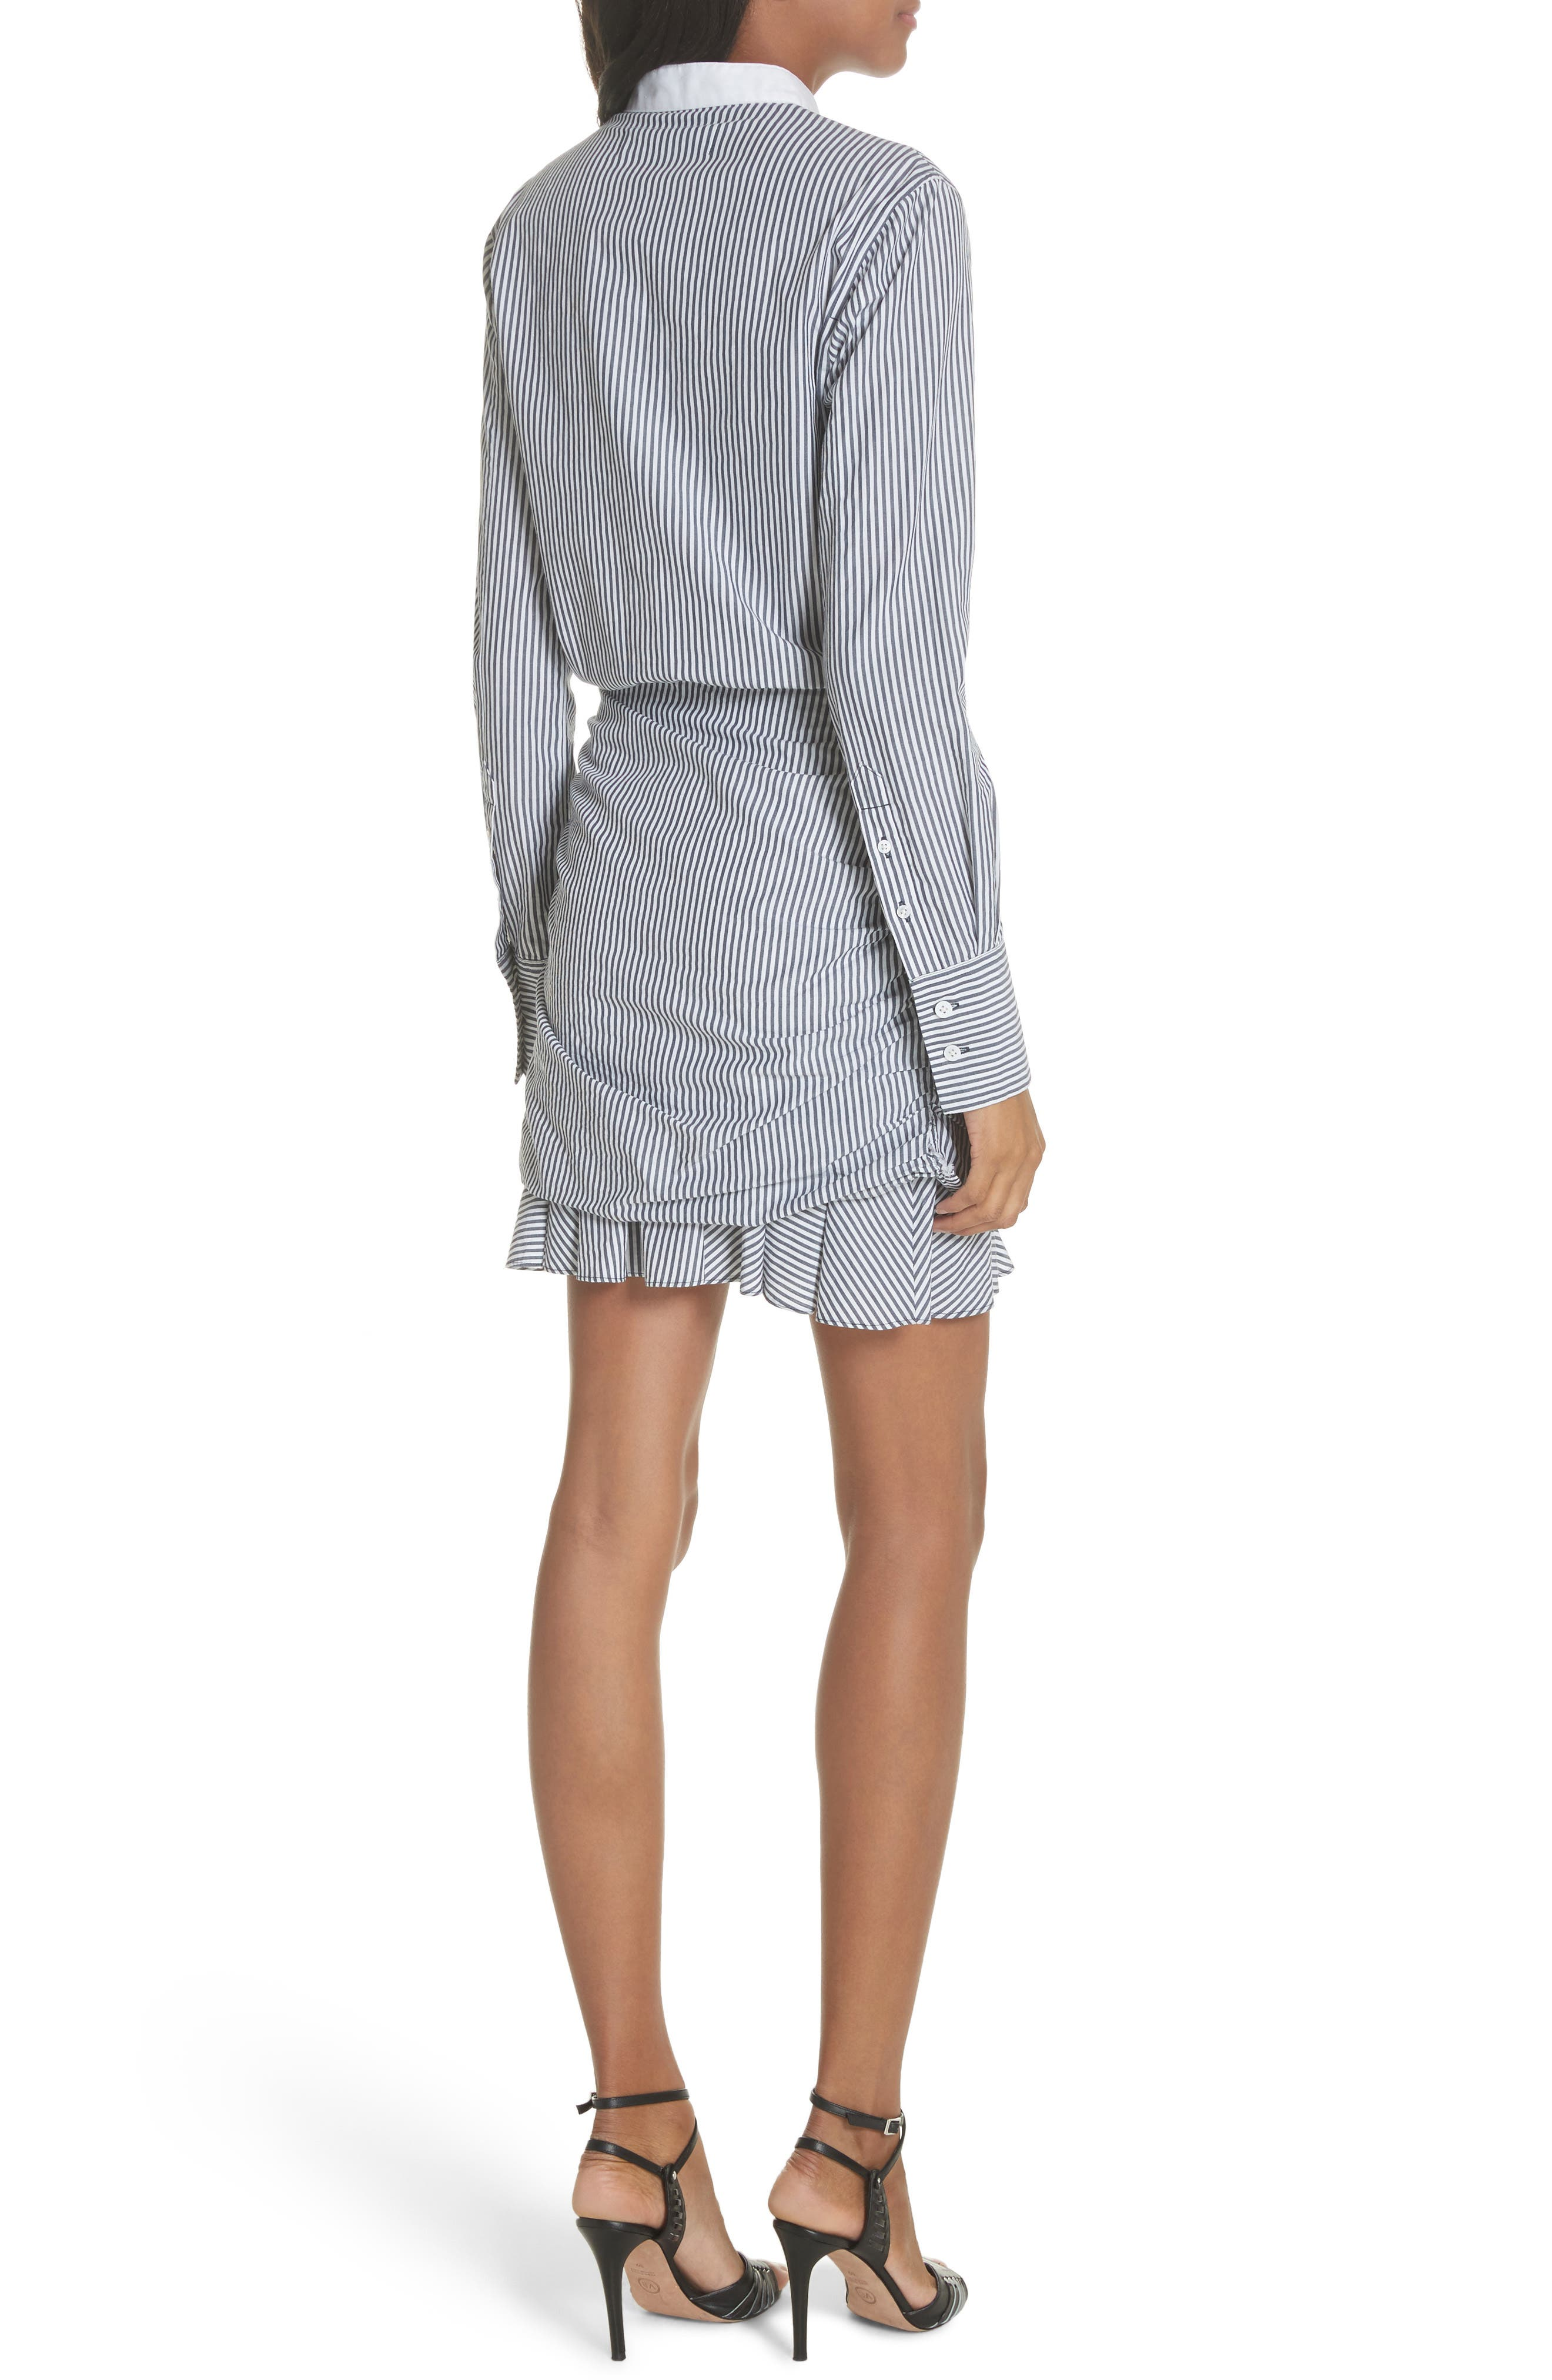 Everett Stripe Shirtdress,                             Alternate thumbnail 2, color,                             Black/ White Stripe